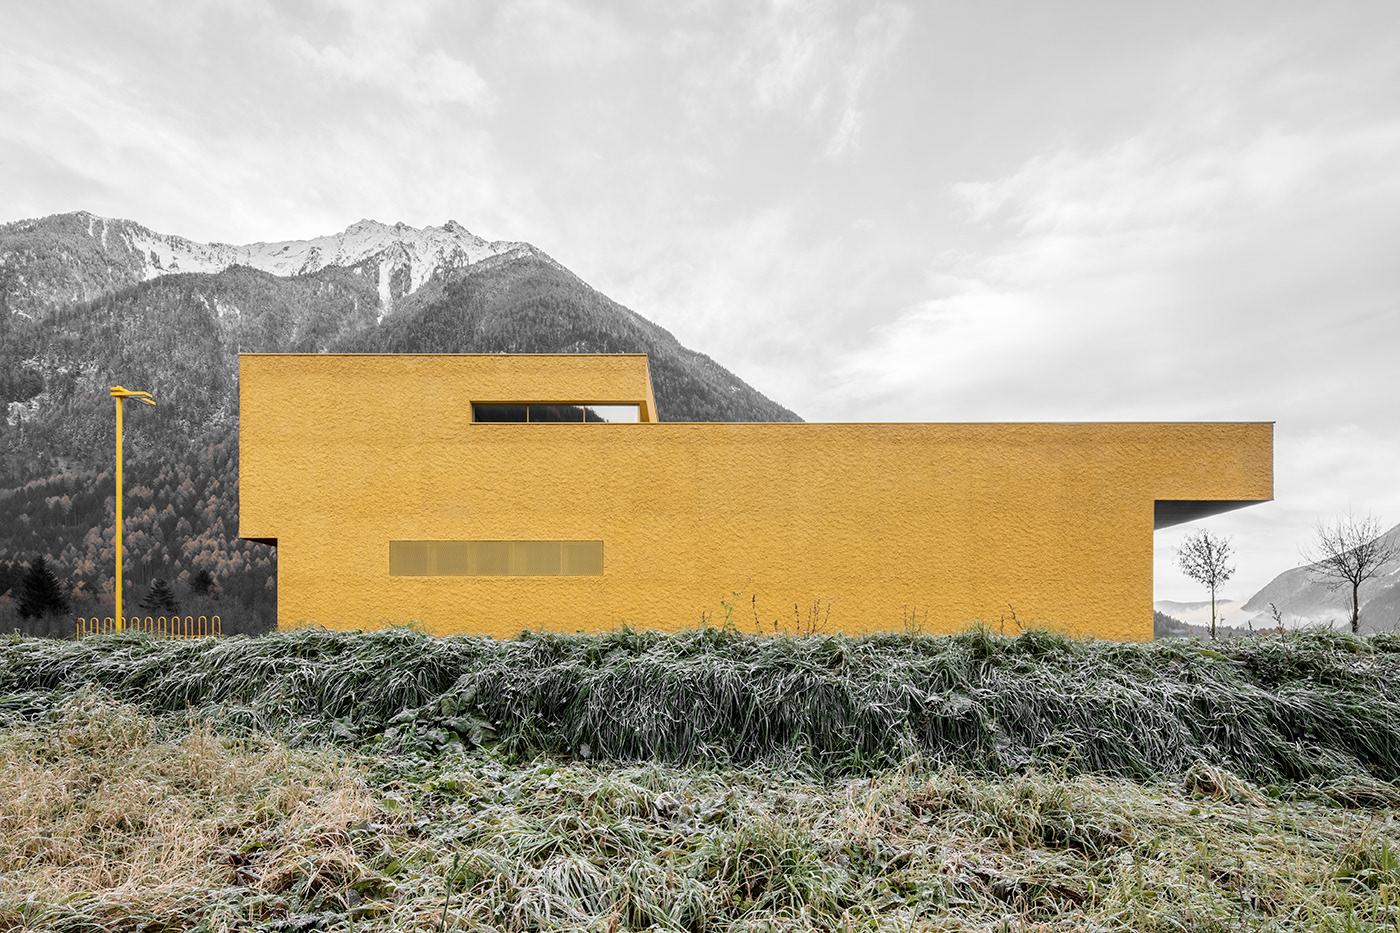 pedevilla architects feuerwehr sand in taufers i. Black Bedroom Furniture Sets. Home Design Ideas